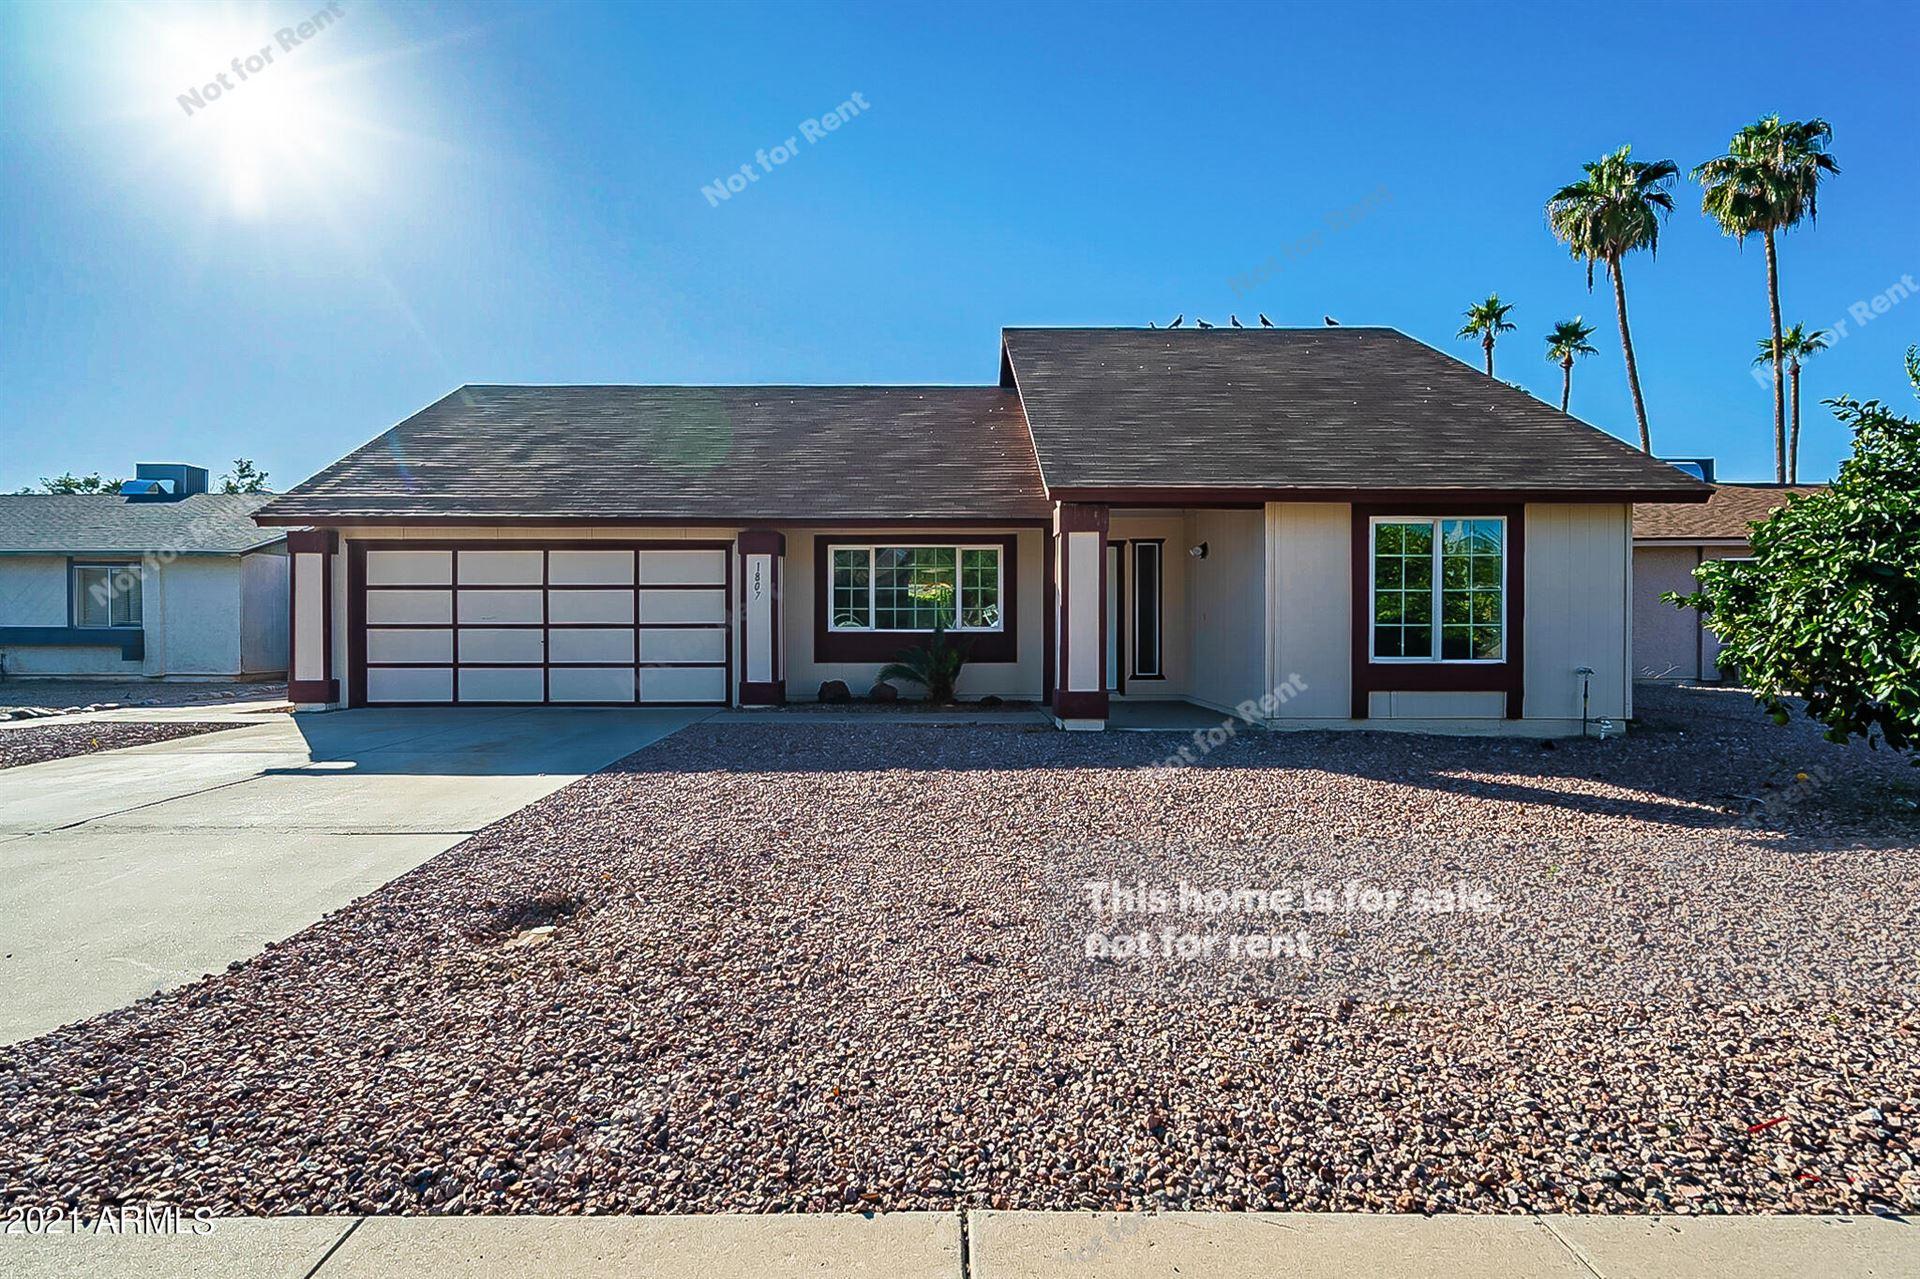 Photo of 1807 W MISSION Drive, Chandler, AZ 85224 (MLS # 6307851)